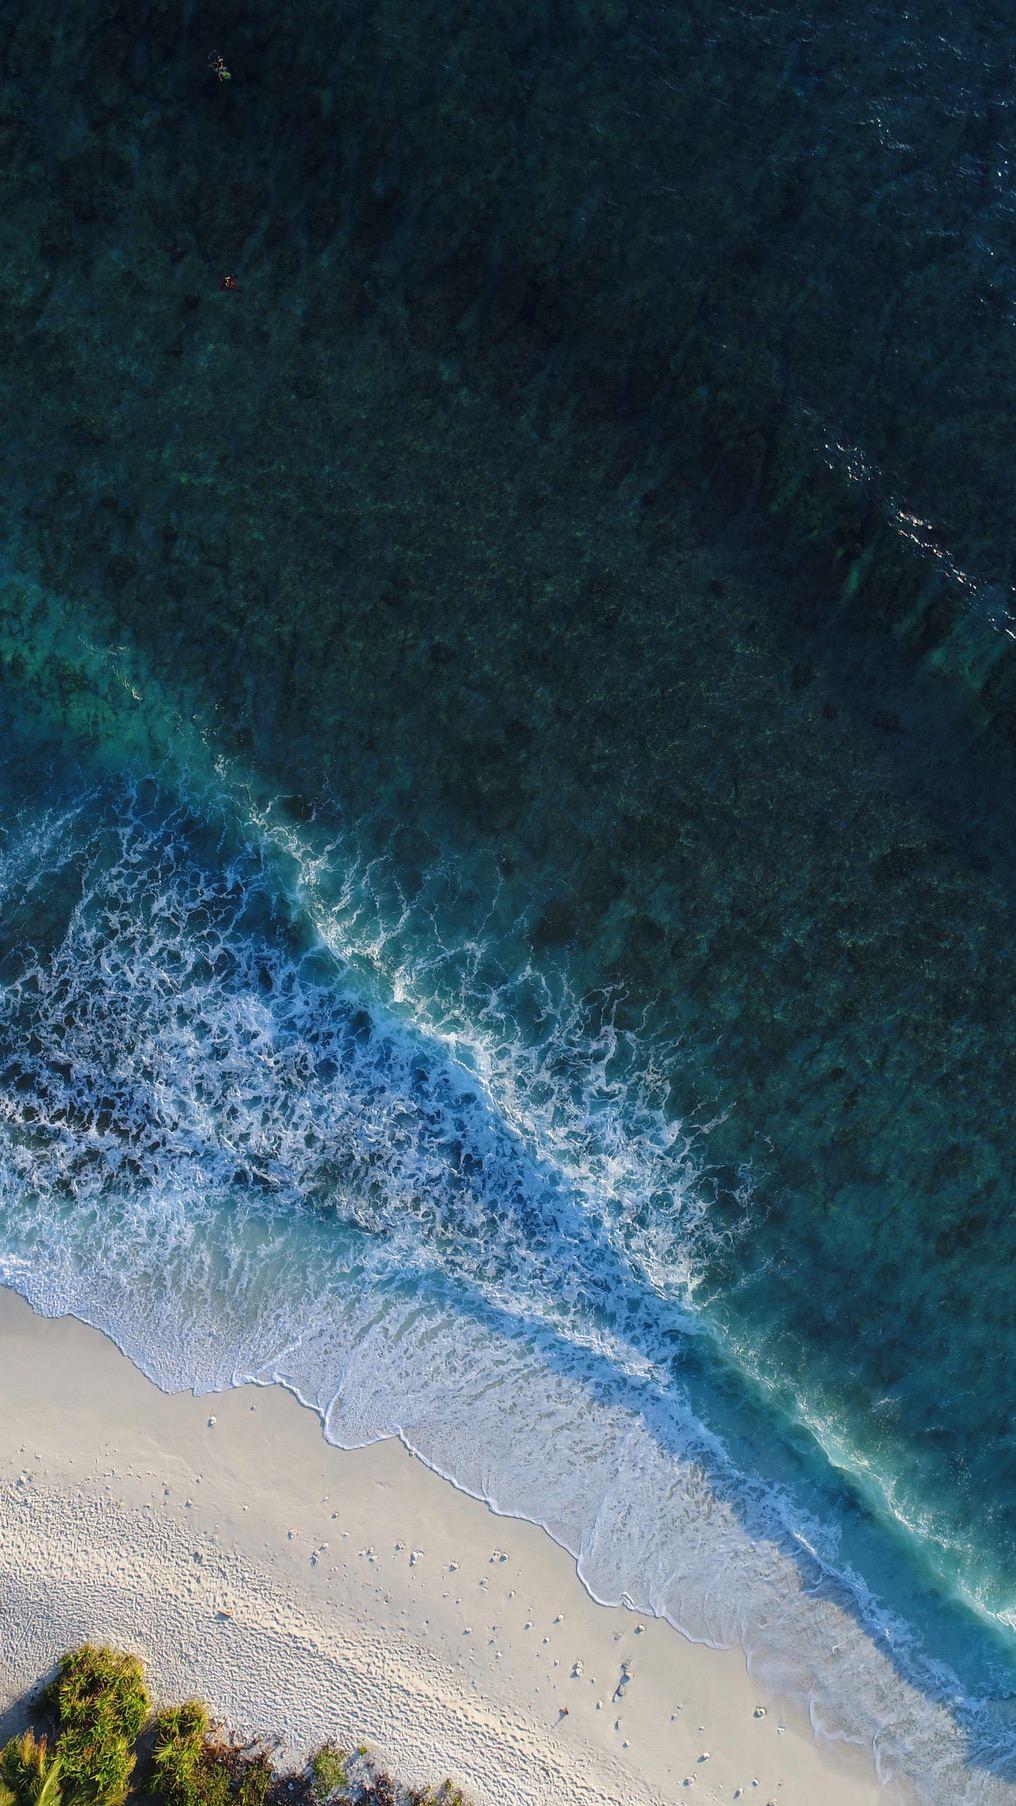 Beach iphone wallpaper and ocean wallpaper